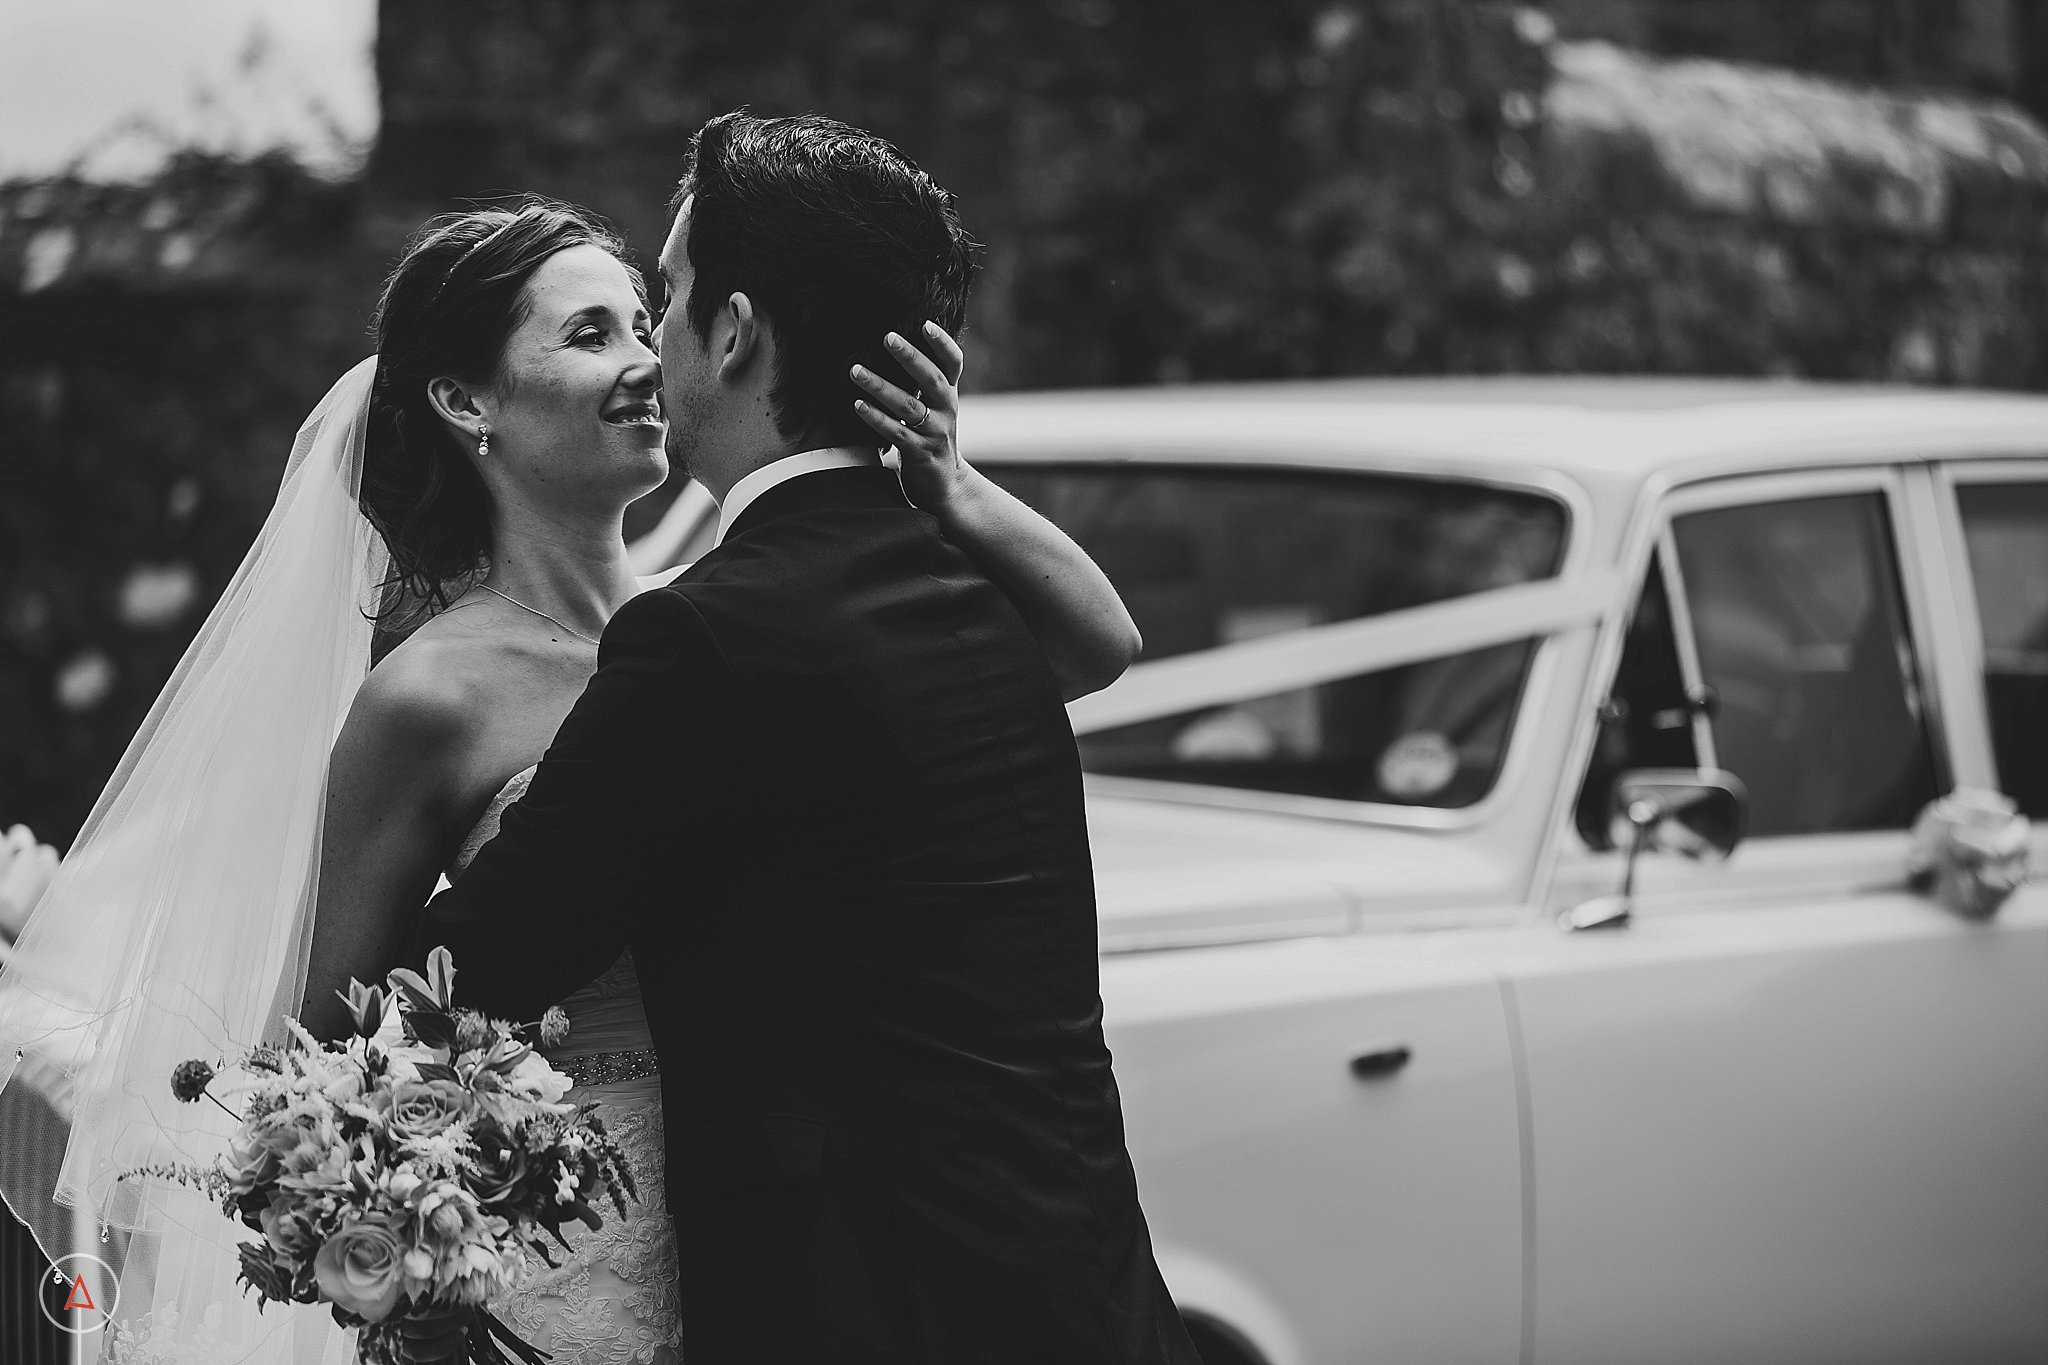 st-donats-llantwit-major-wedding-photography_0056